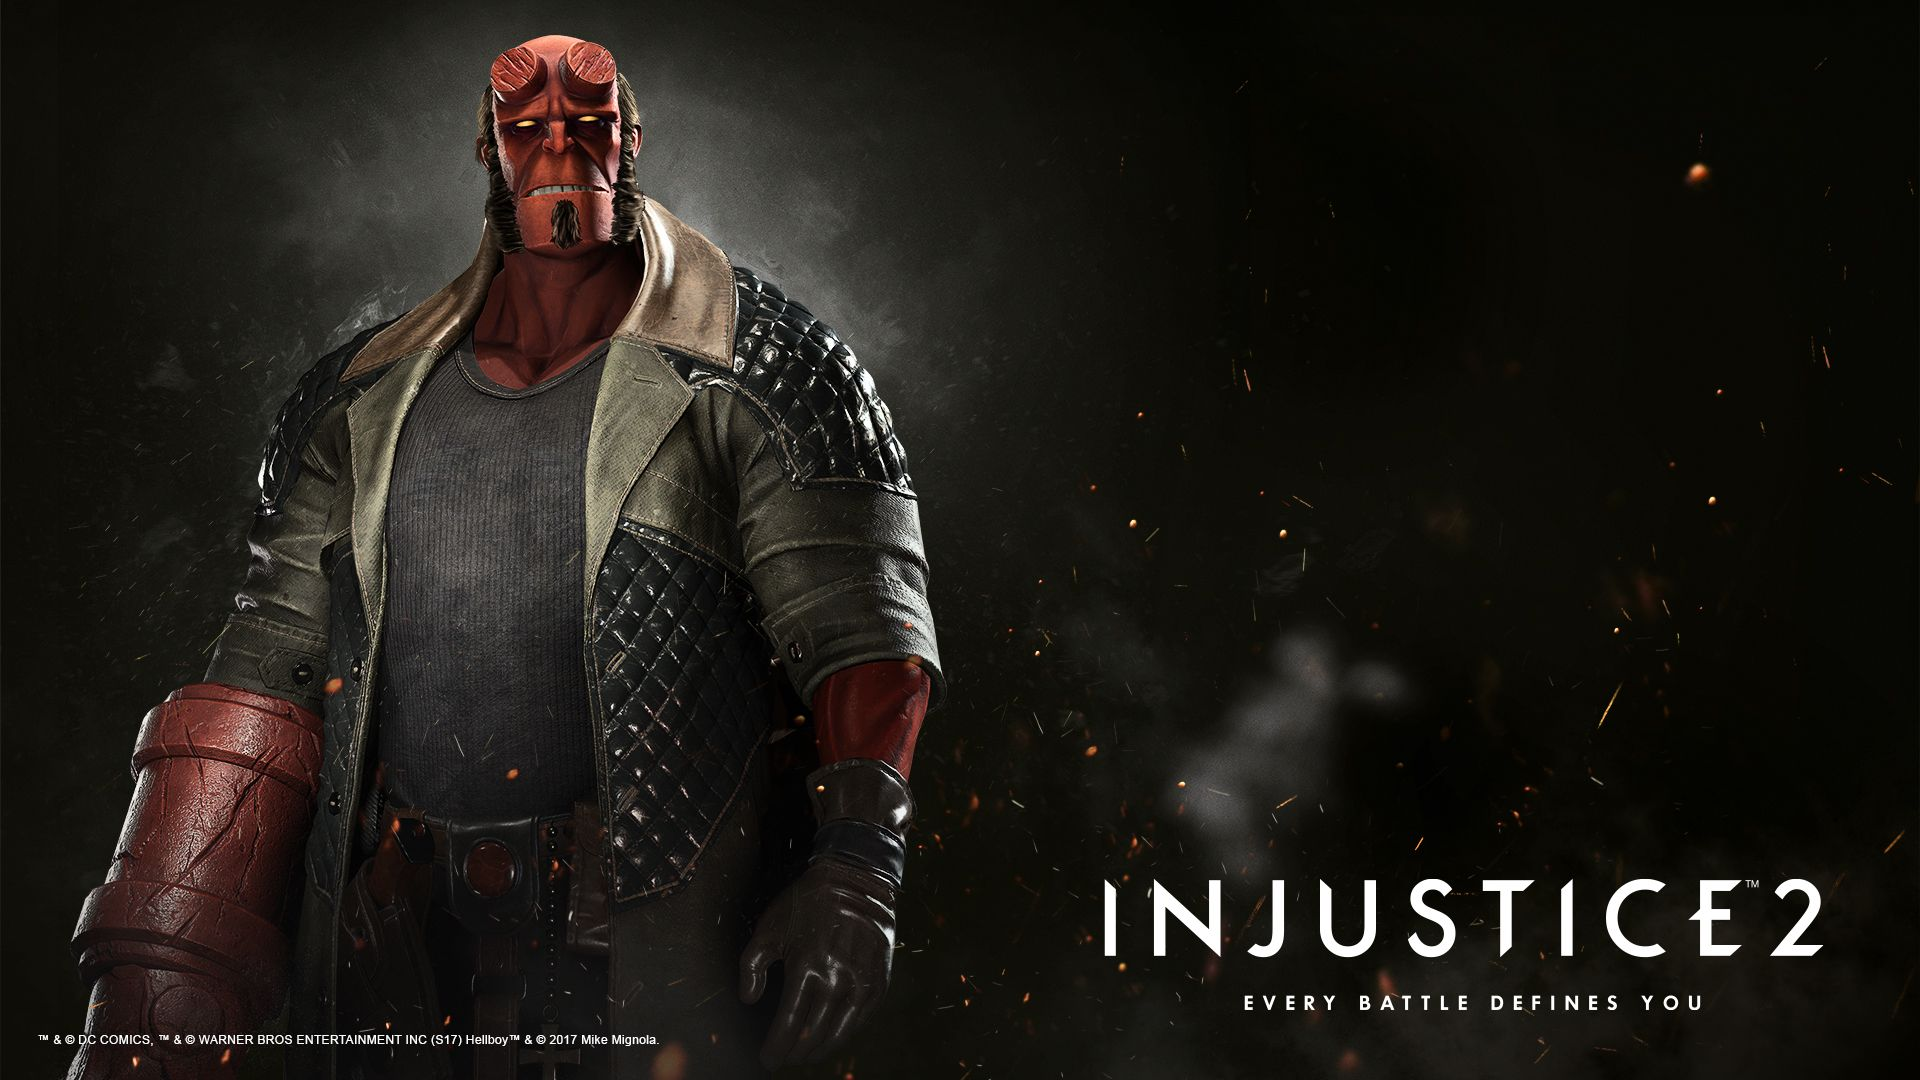 Injustice 2 Wallpaper Hd Injustice 2 Dlc Ninja Turtles 59940